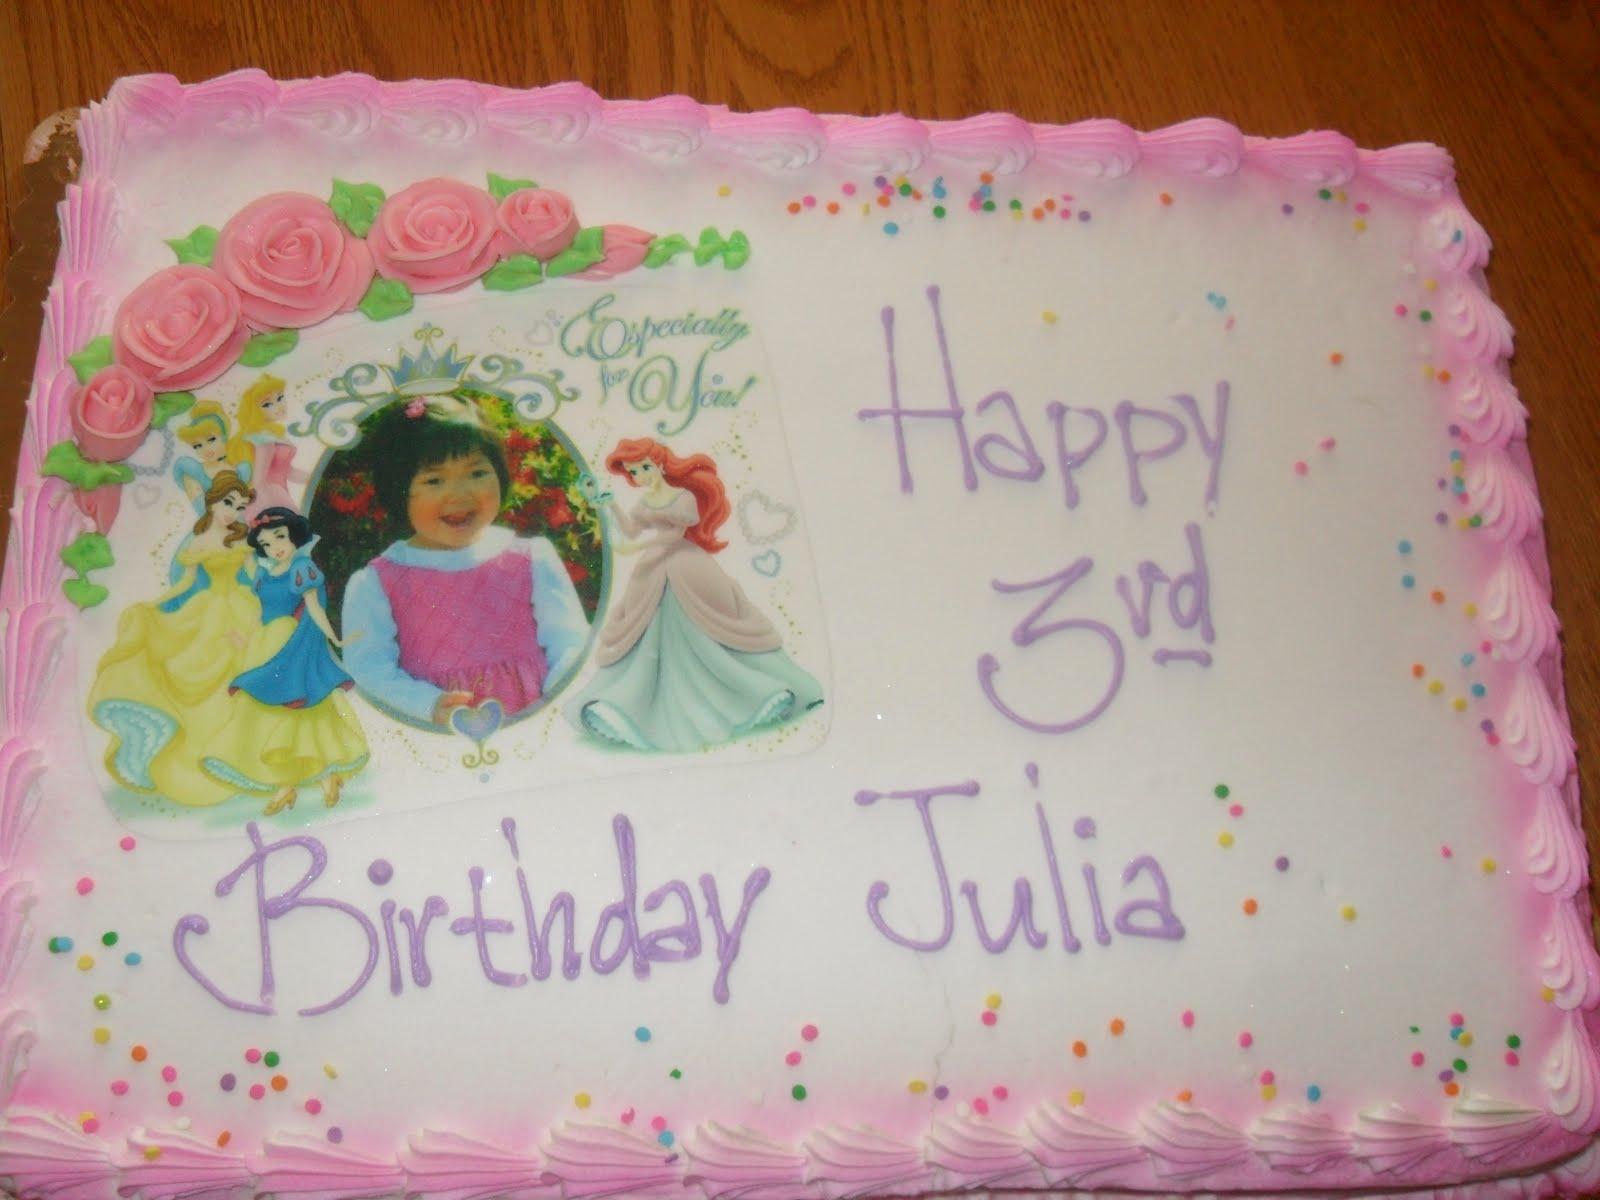 Juliashome4ever Happy Birthday Evan And Julia